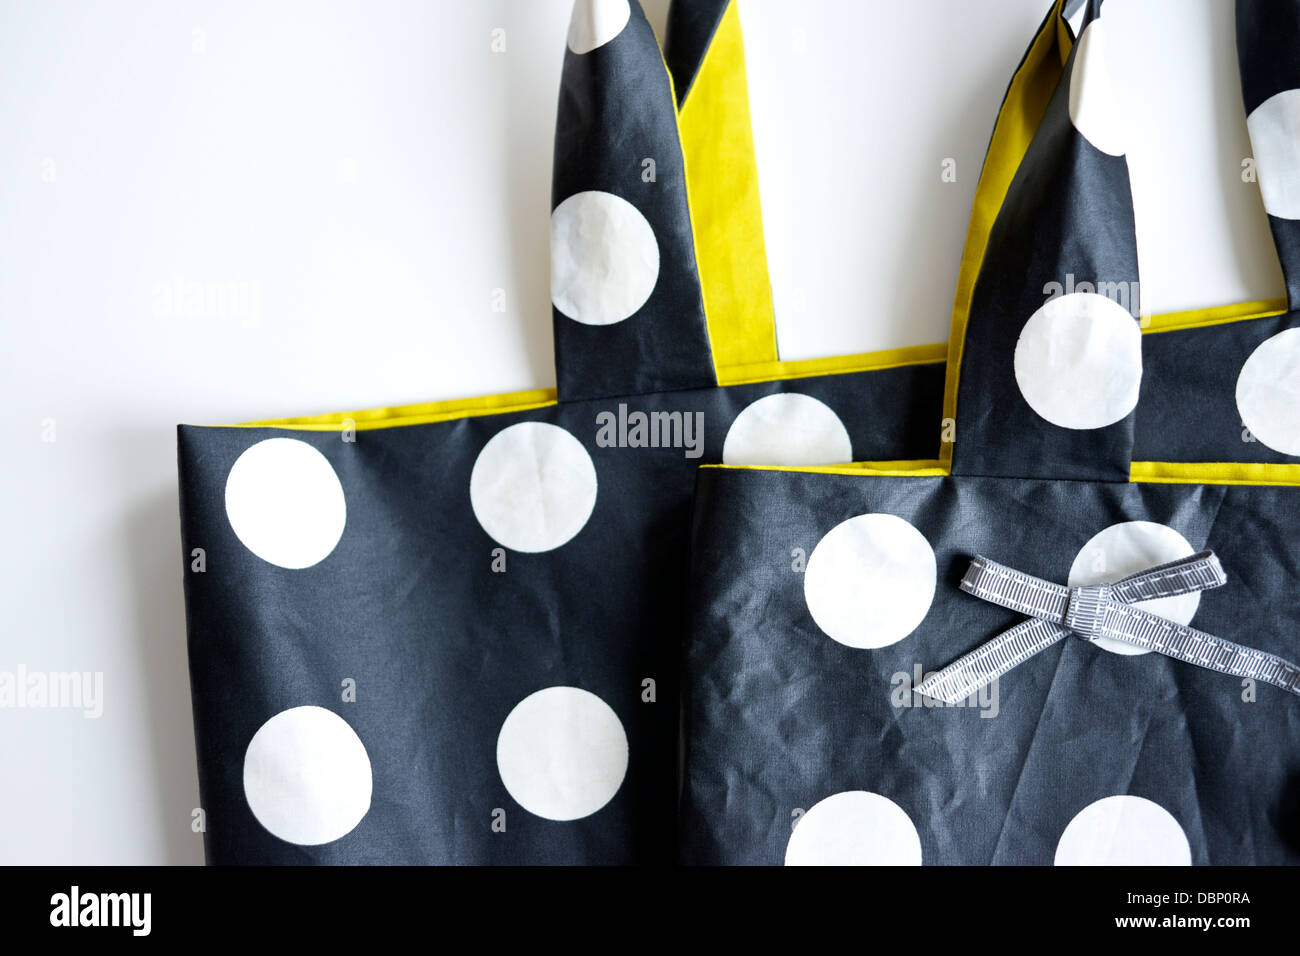 Bag with polka dots, close-up, Munich, Bavaria, Germany - Stock Image